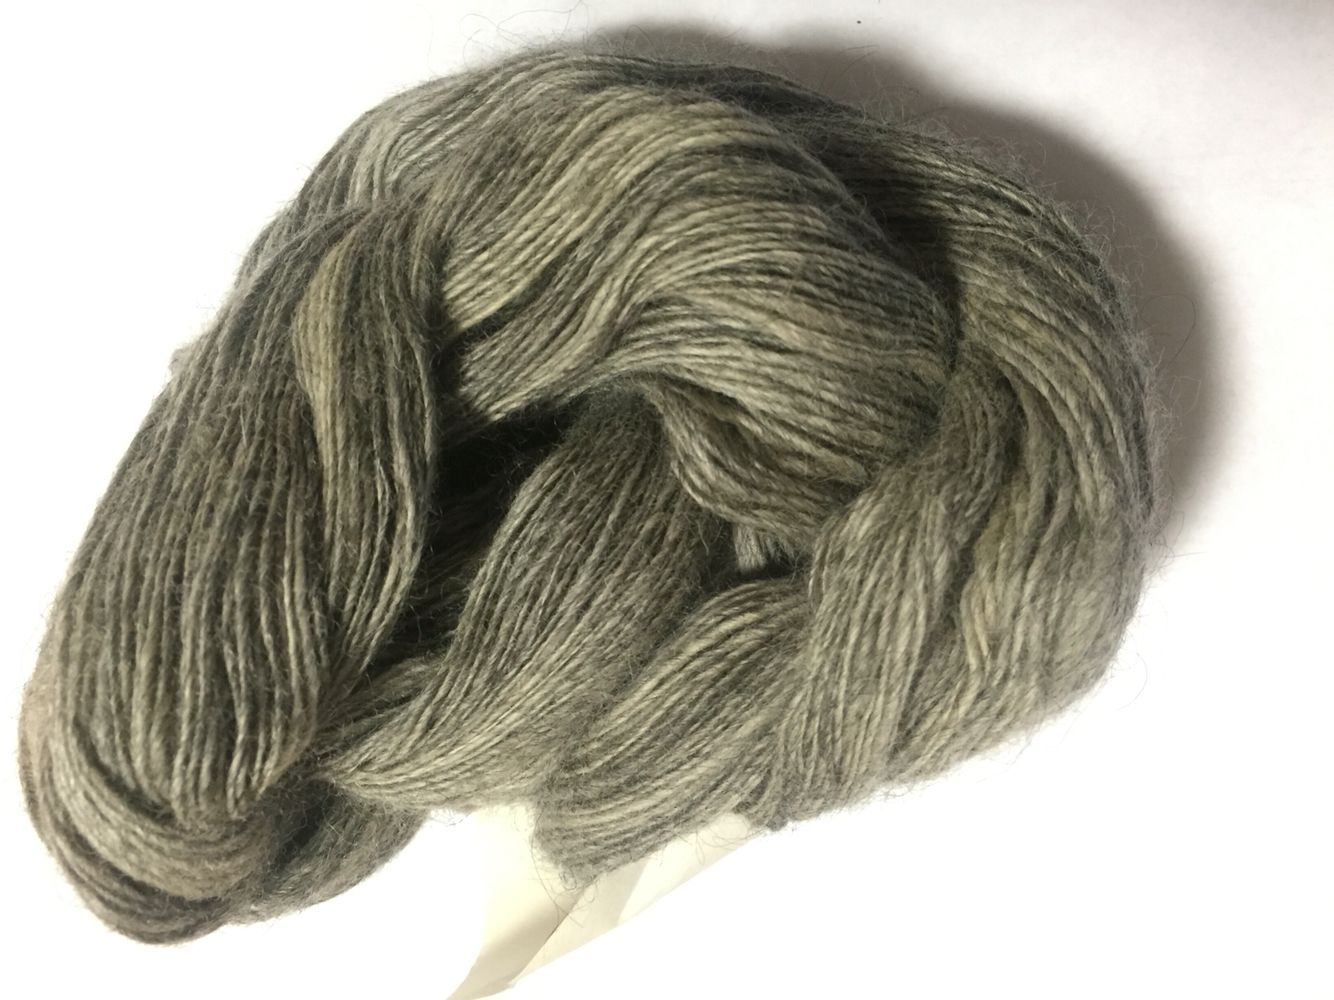 Handspun, alpaca yarn